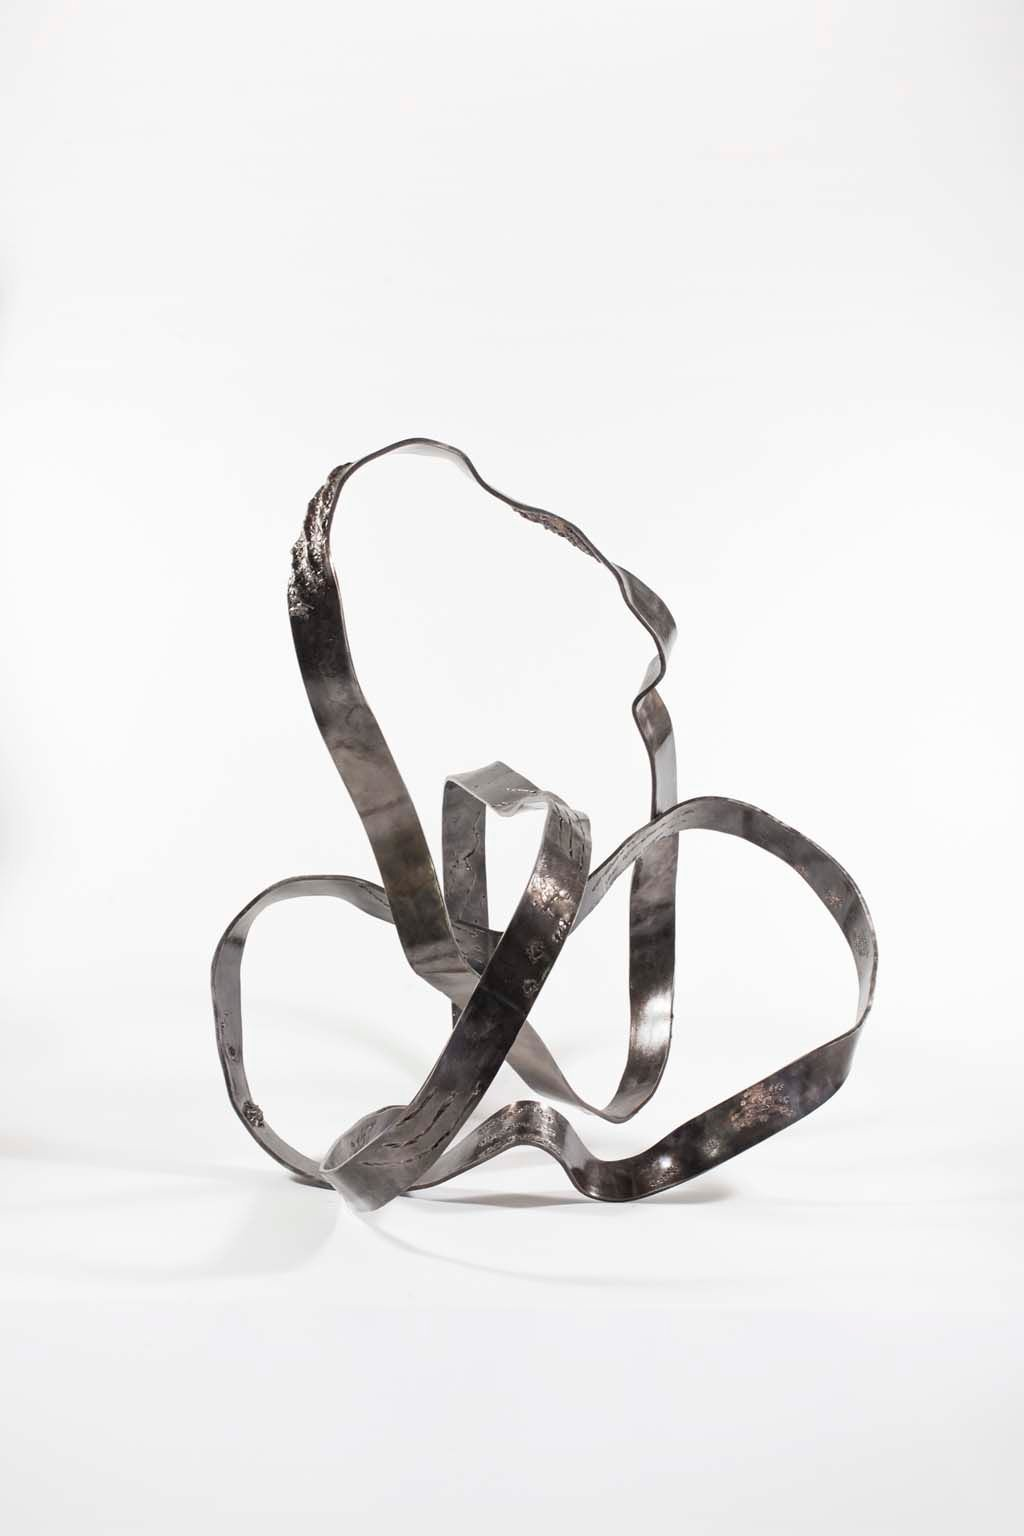 Oblivion III | 2016 |  Iron & brass sculpture | Rami Ater | רמי אטר